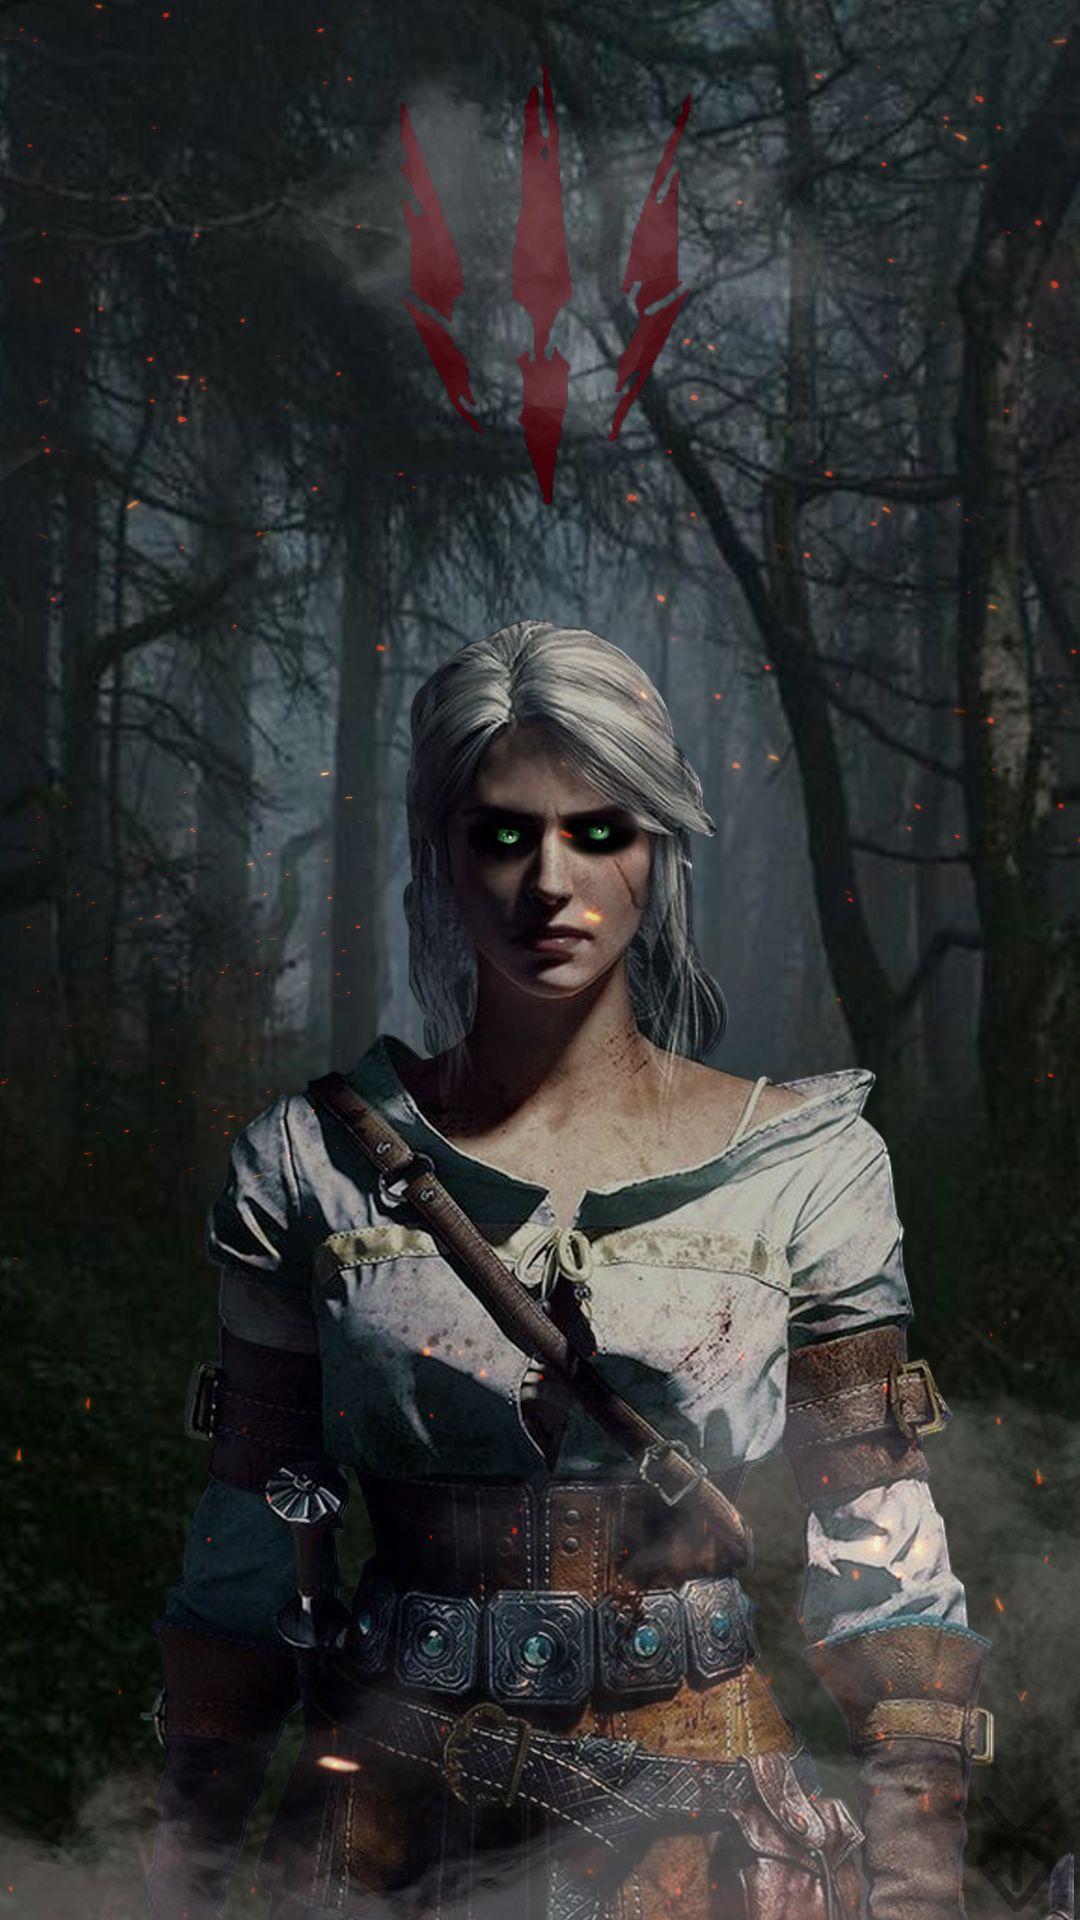 Ciri Riannon The Witcher Ciri Witcher Witcher Art Ciri witcher 3 hd games artwork